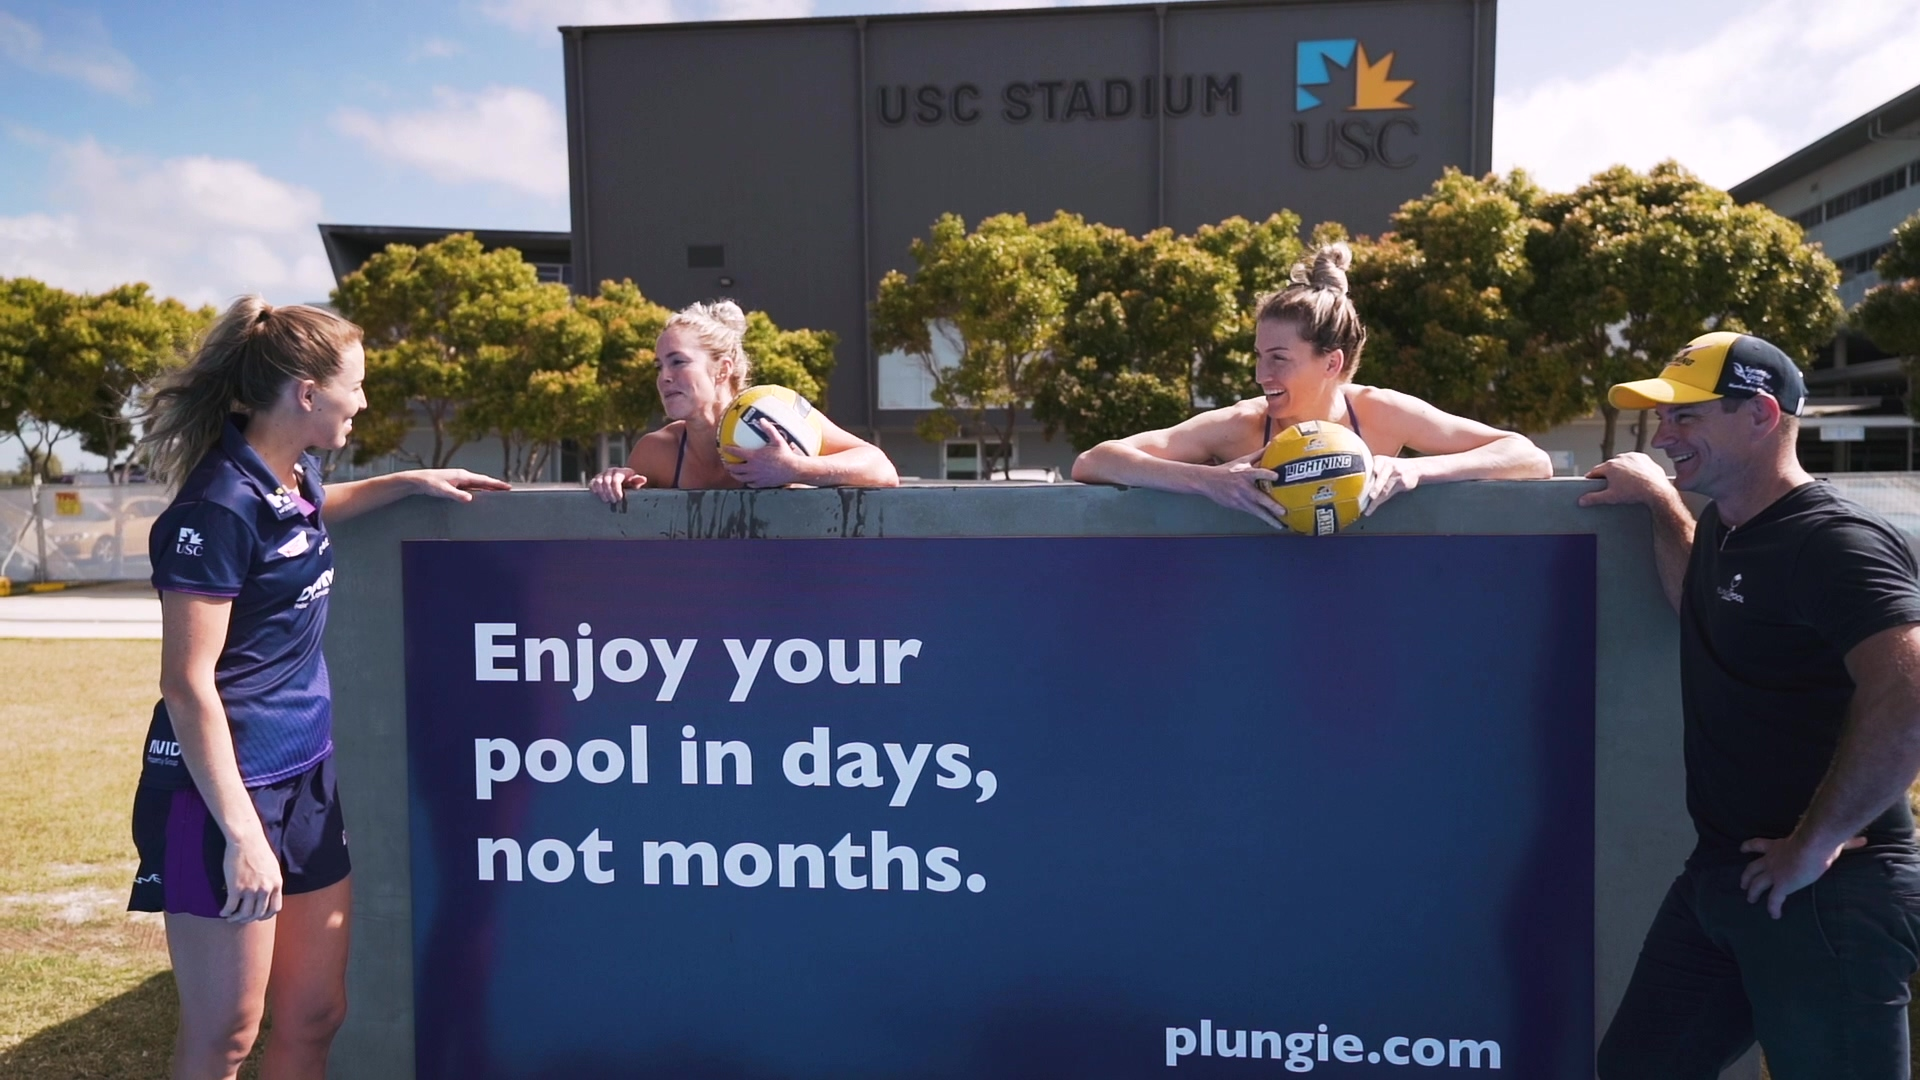 Plungie Pools - Partnership Announcement (1)